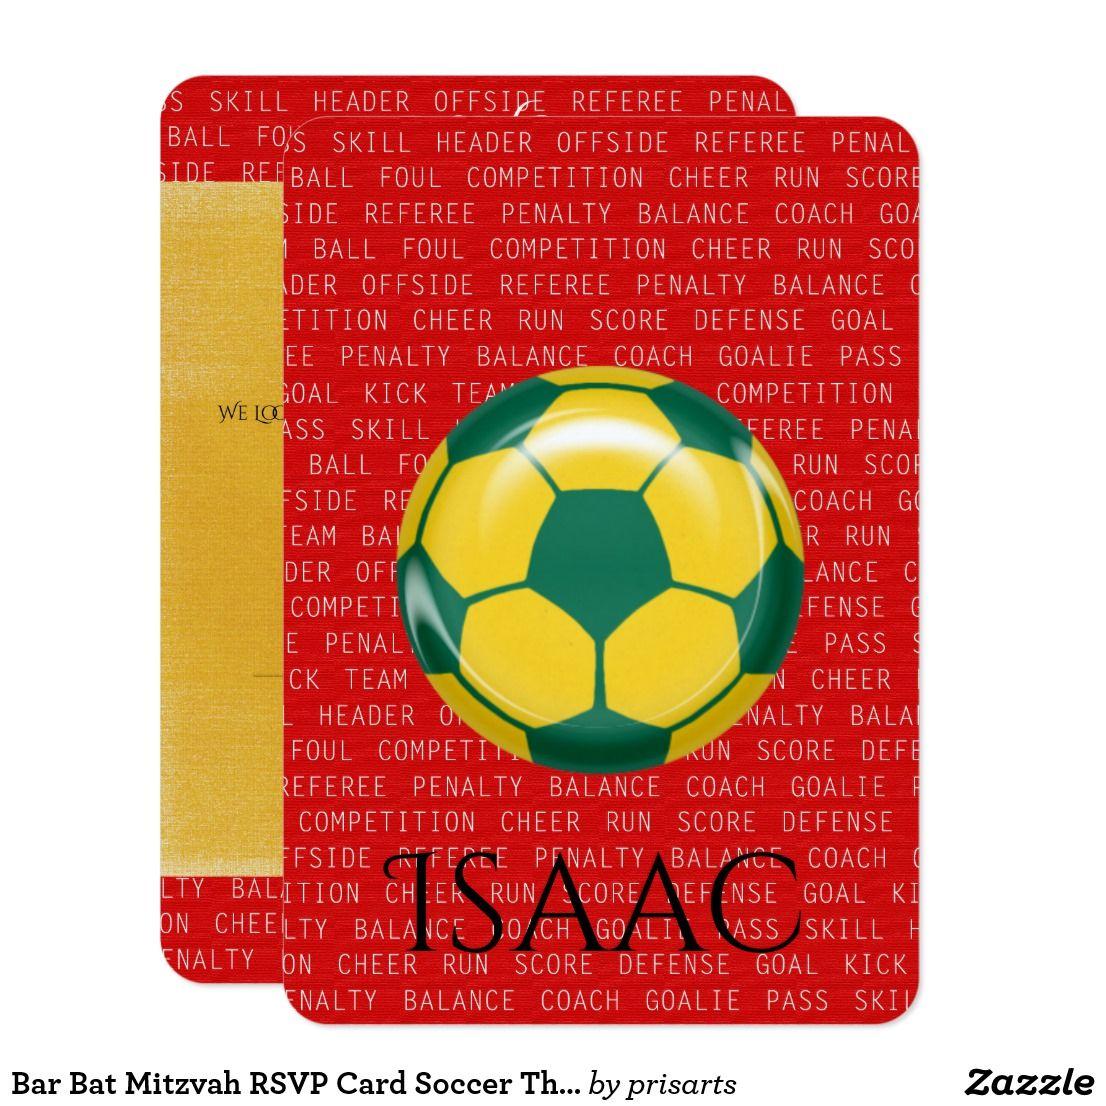 Balance Ball Kick: Bar Bat Mitzvah RSVP Card Soccer Theme